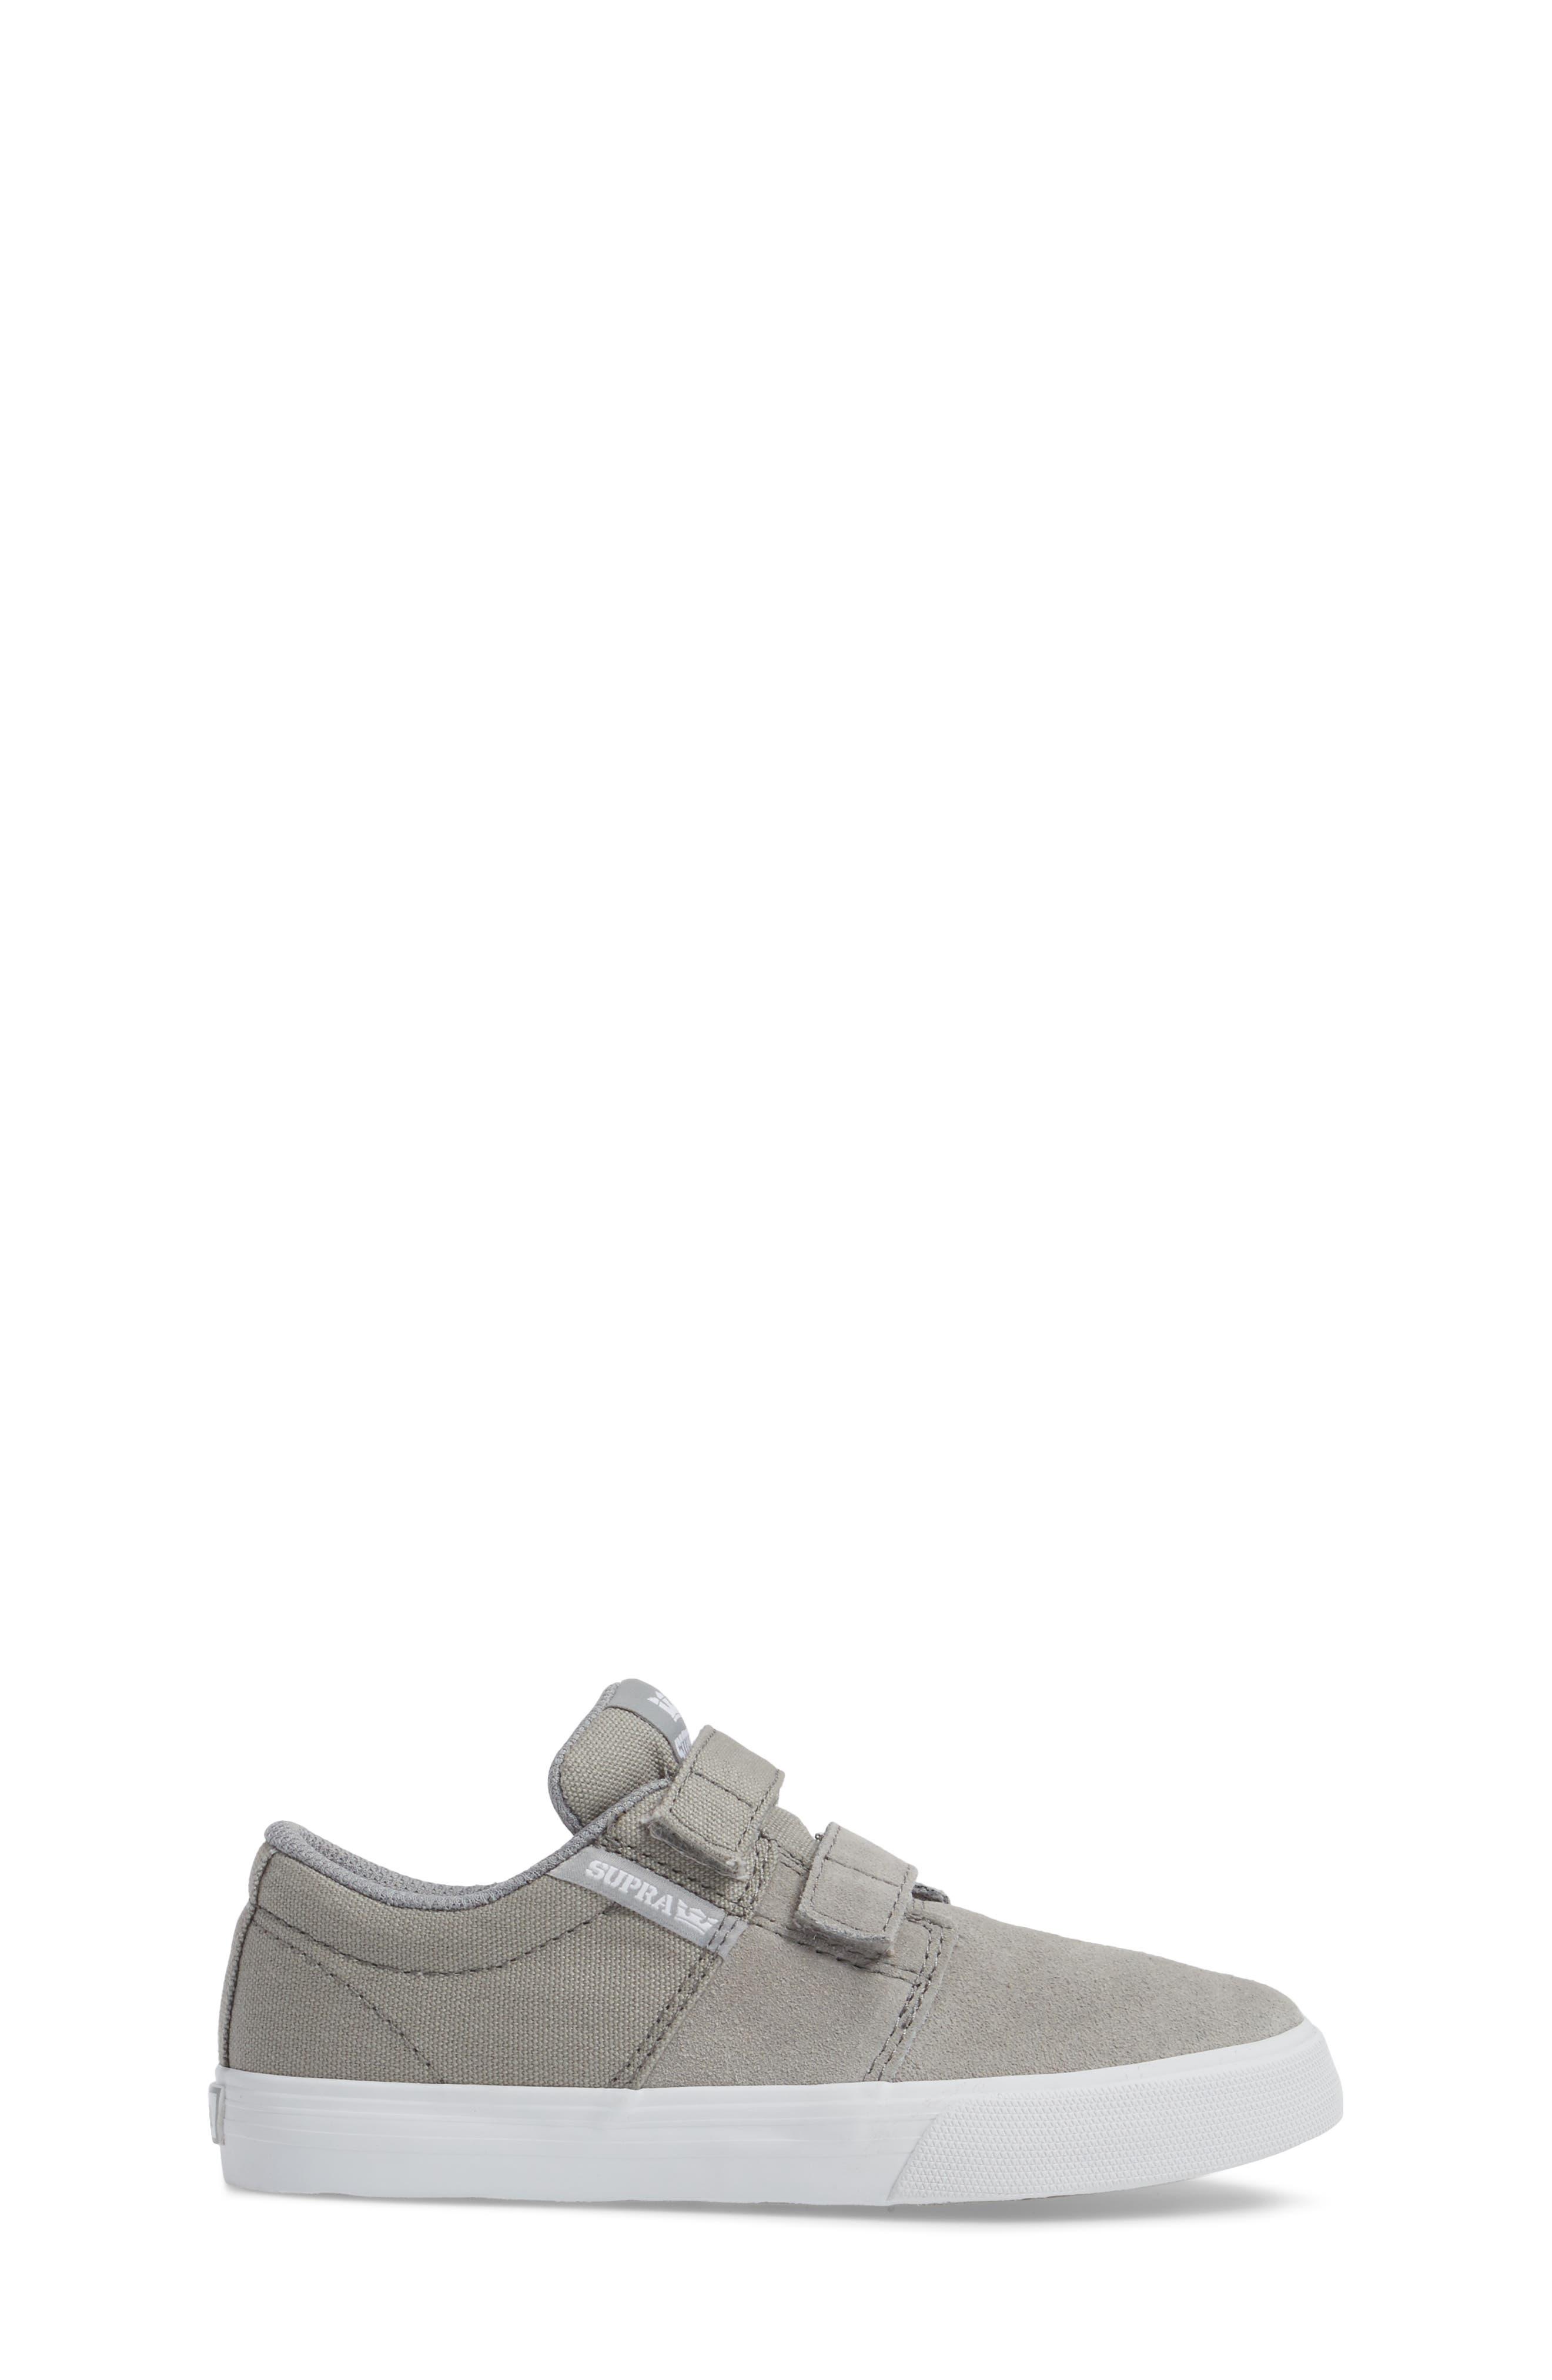 Alternate Image 3  - Supra Stacks Low Top Sneaker (Toddler, Little Kid & Big Kid)